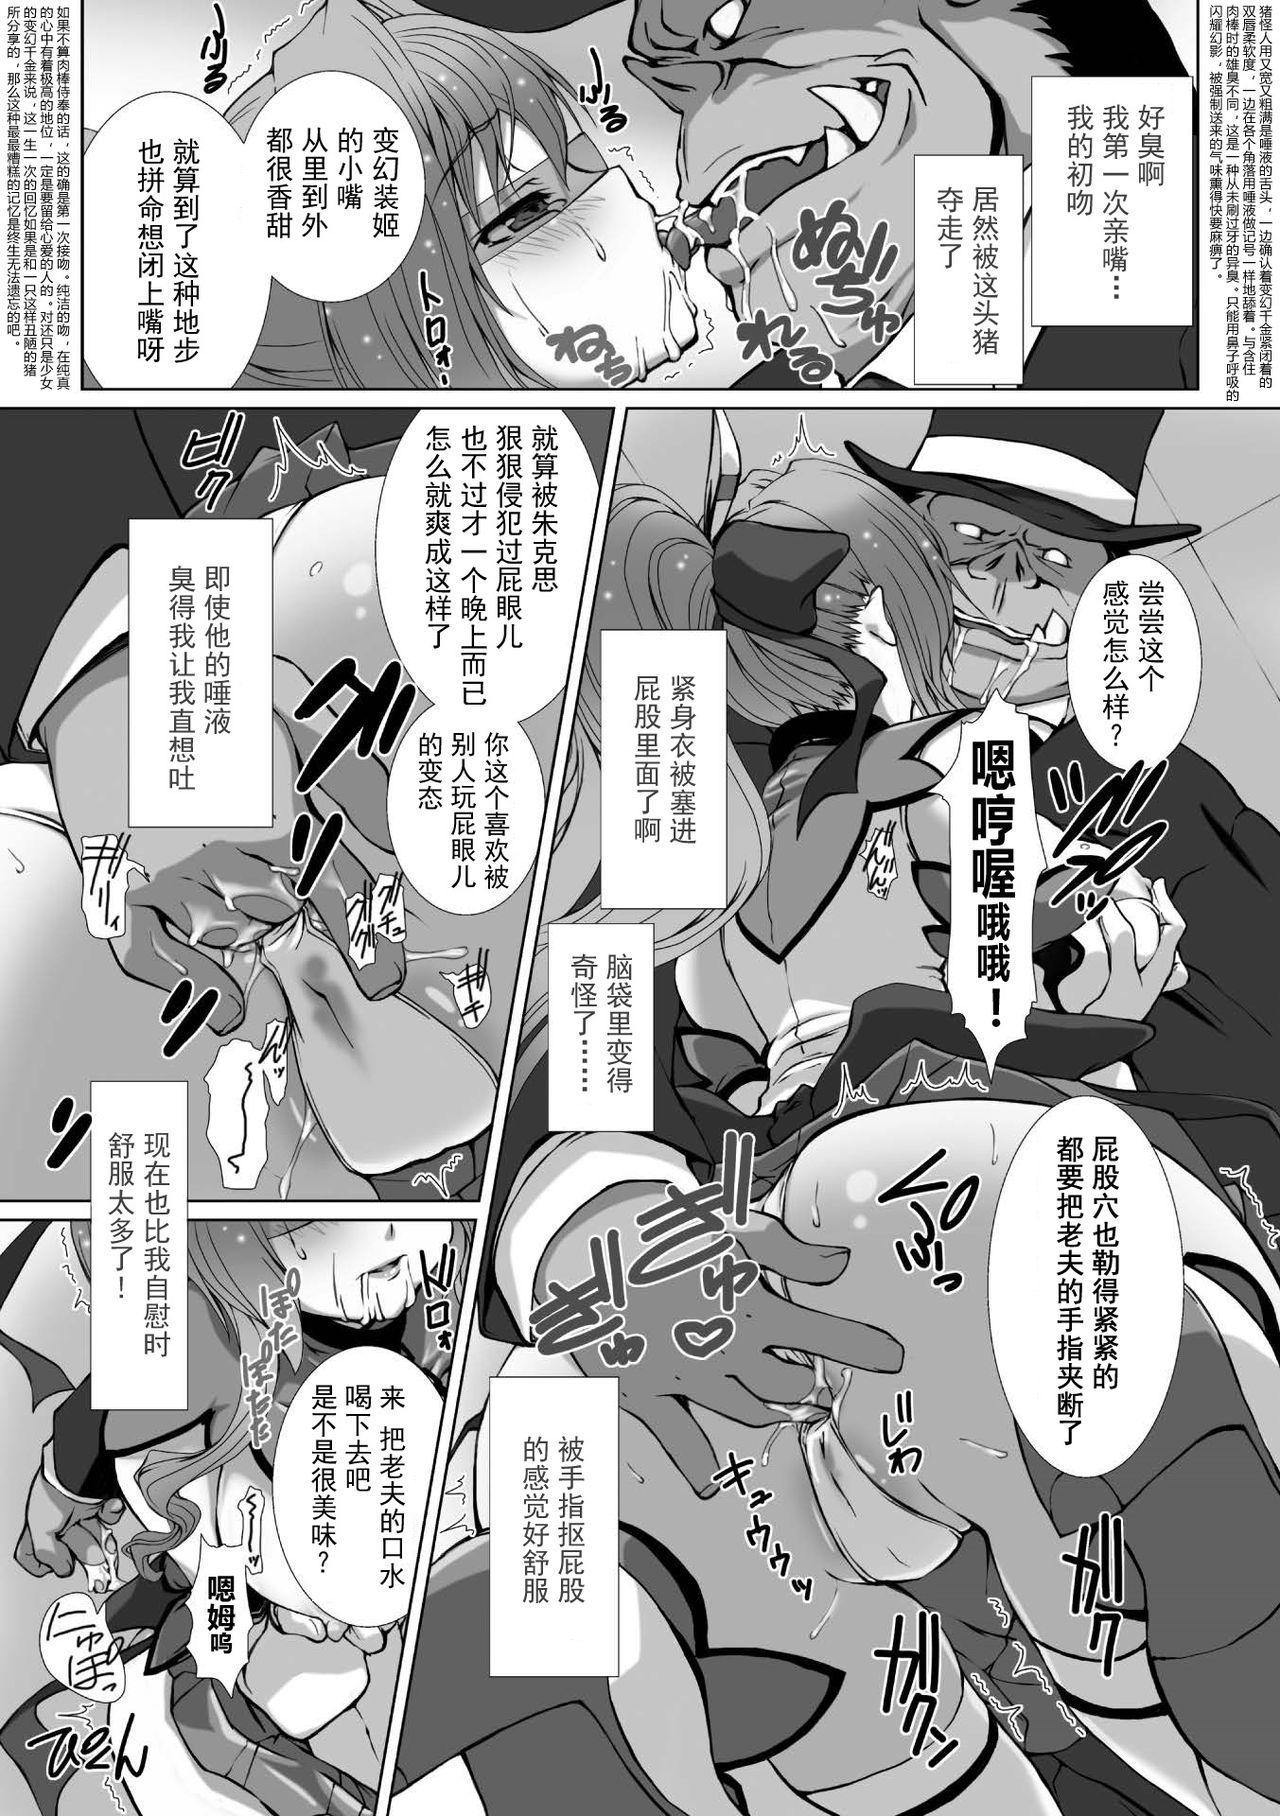 Hengen Souki Shine Mirage THE COMIC EPISODE 1-5 54